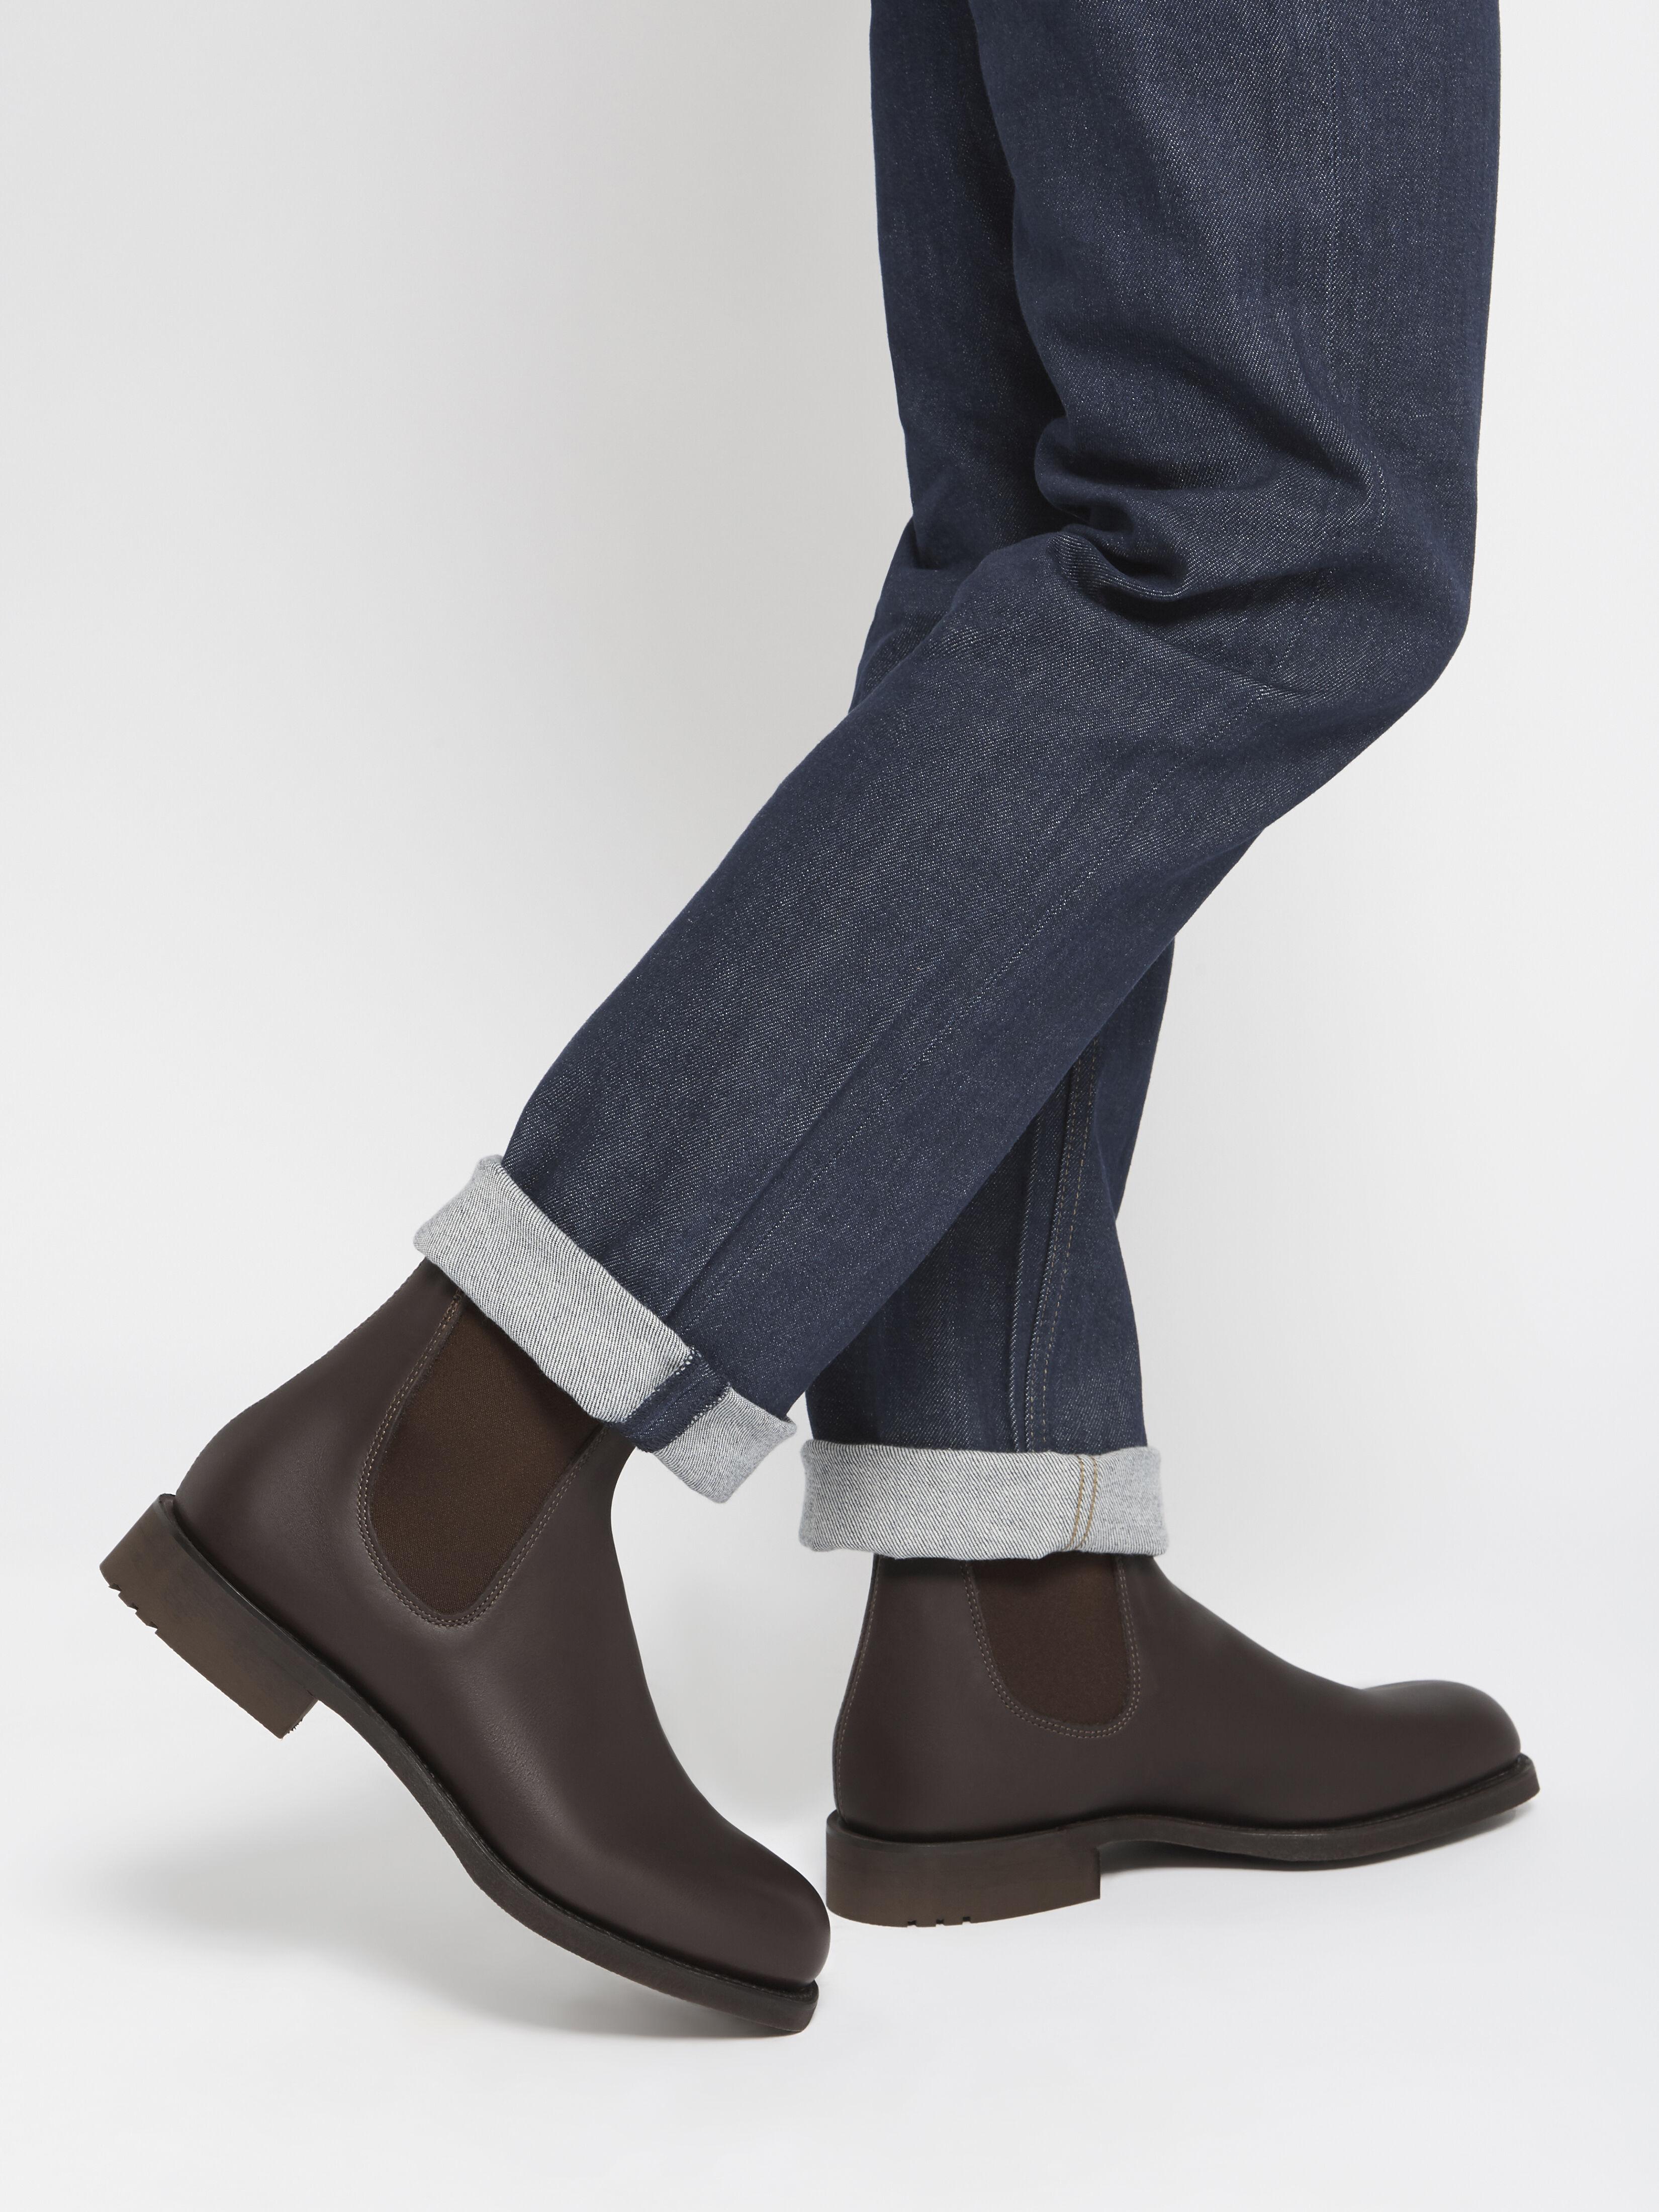 Men's Handcrafted Footwear   R.M.Williams®